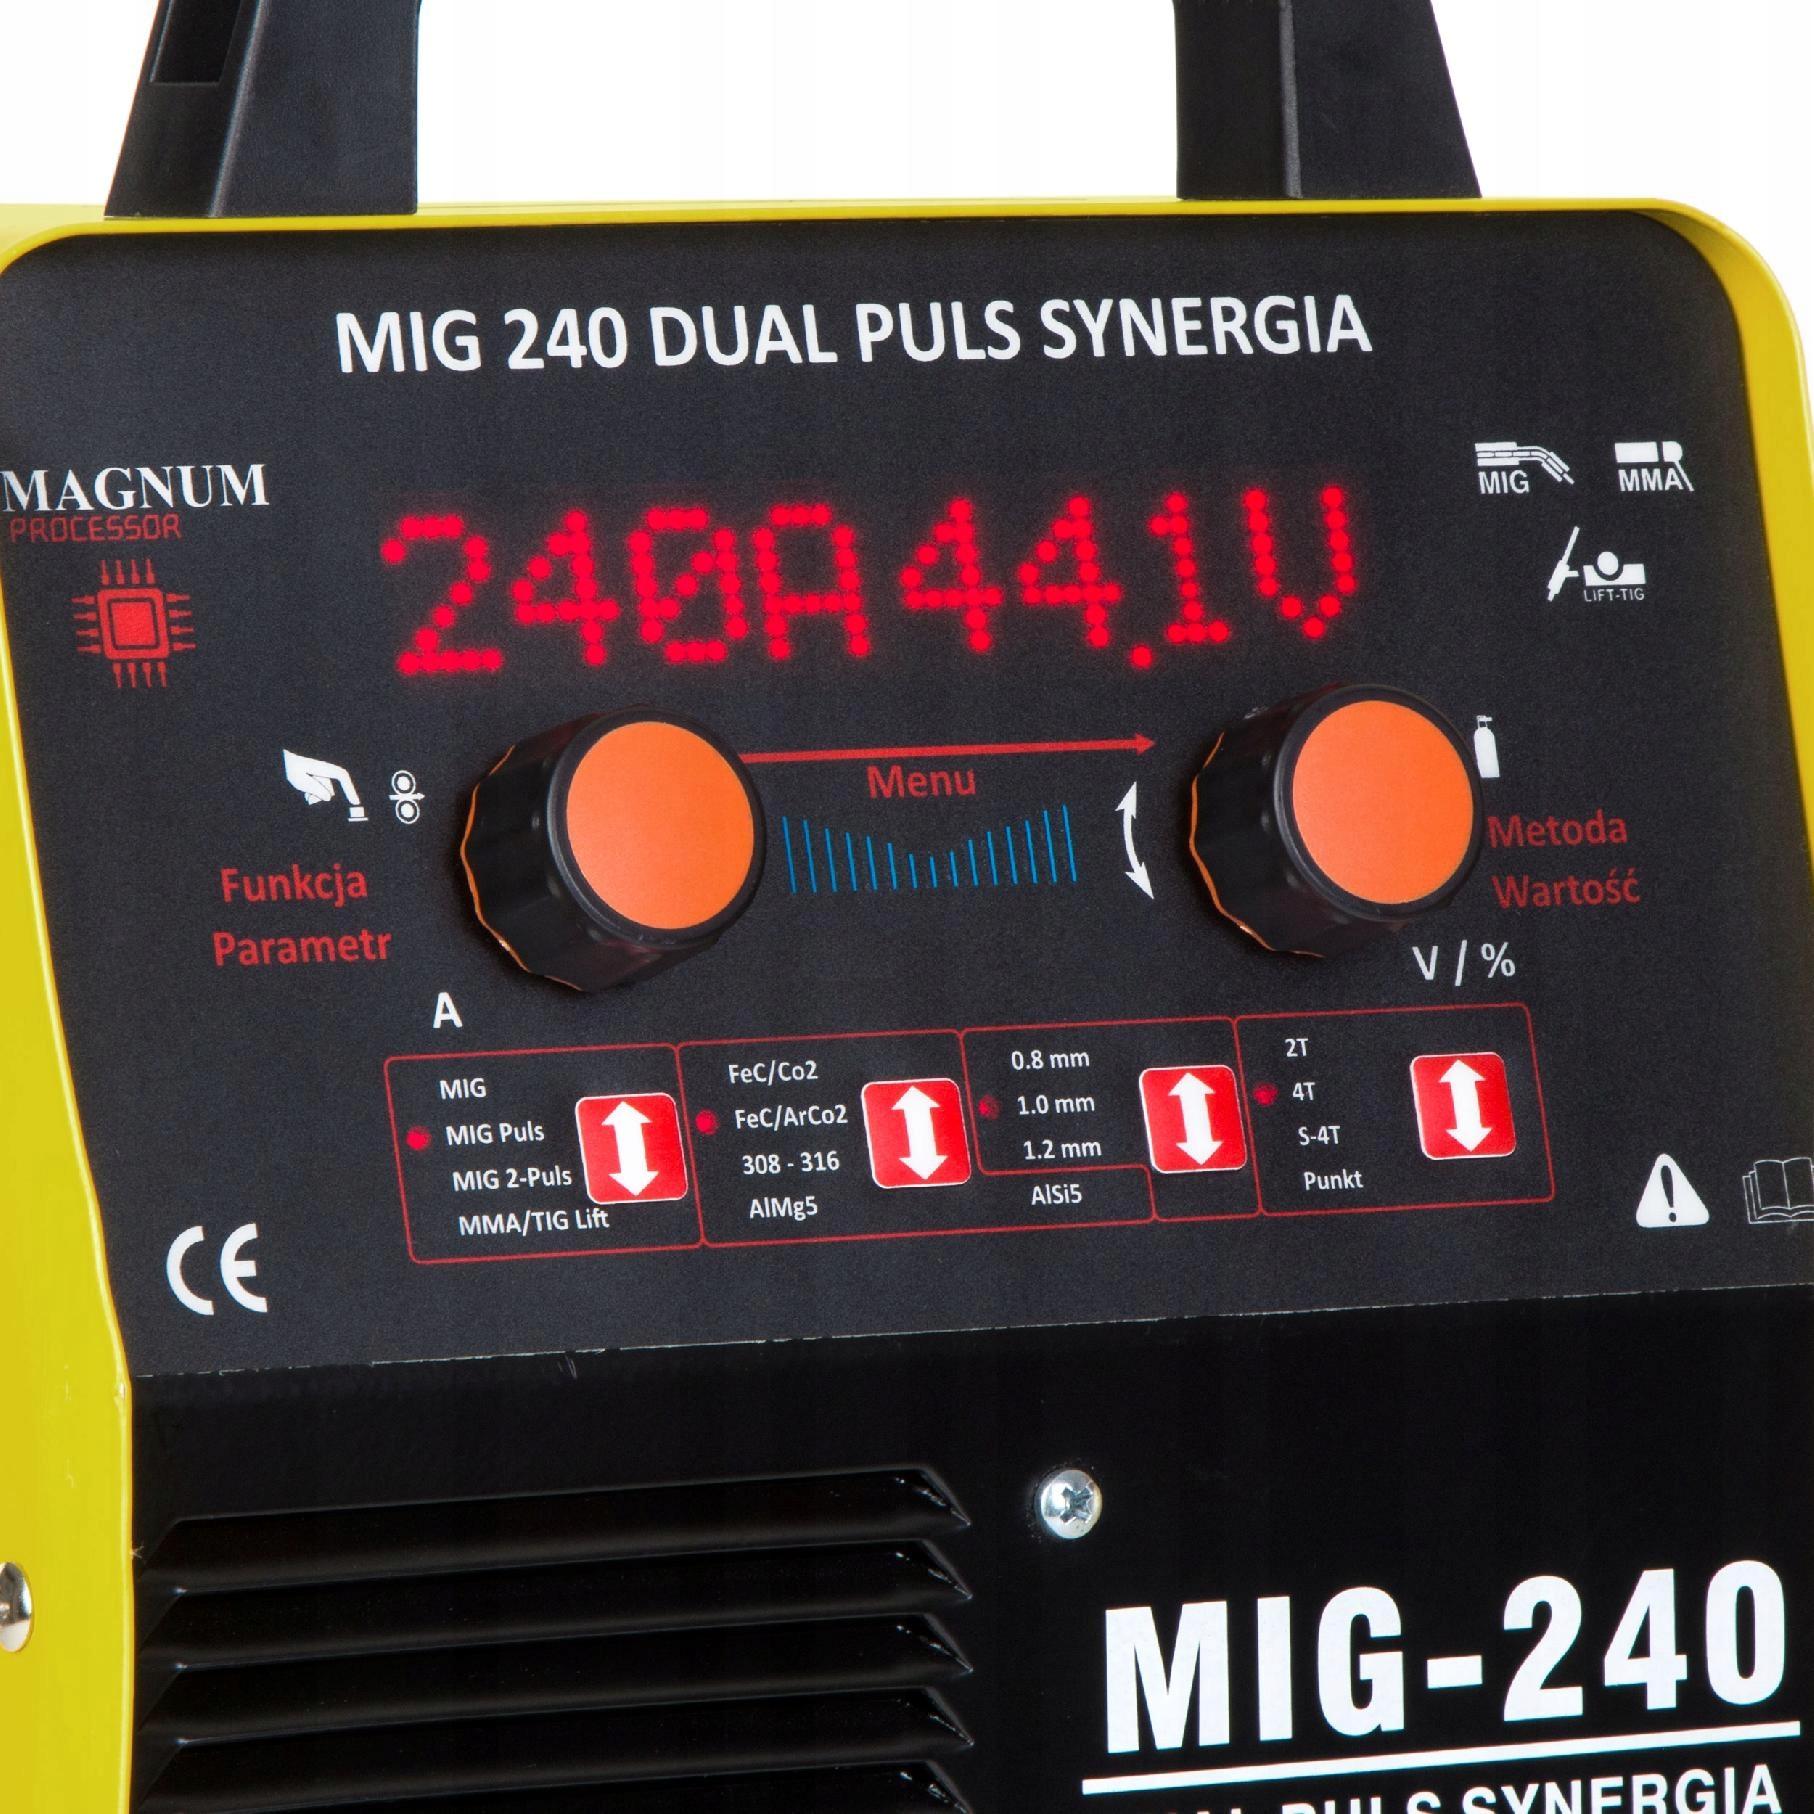 Spawarka MIGOMAT MAGNUM MIG MAG 240 PULS SYNERGIA Kod produktu U MI 240 DP